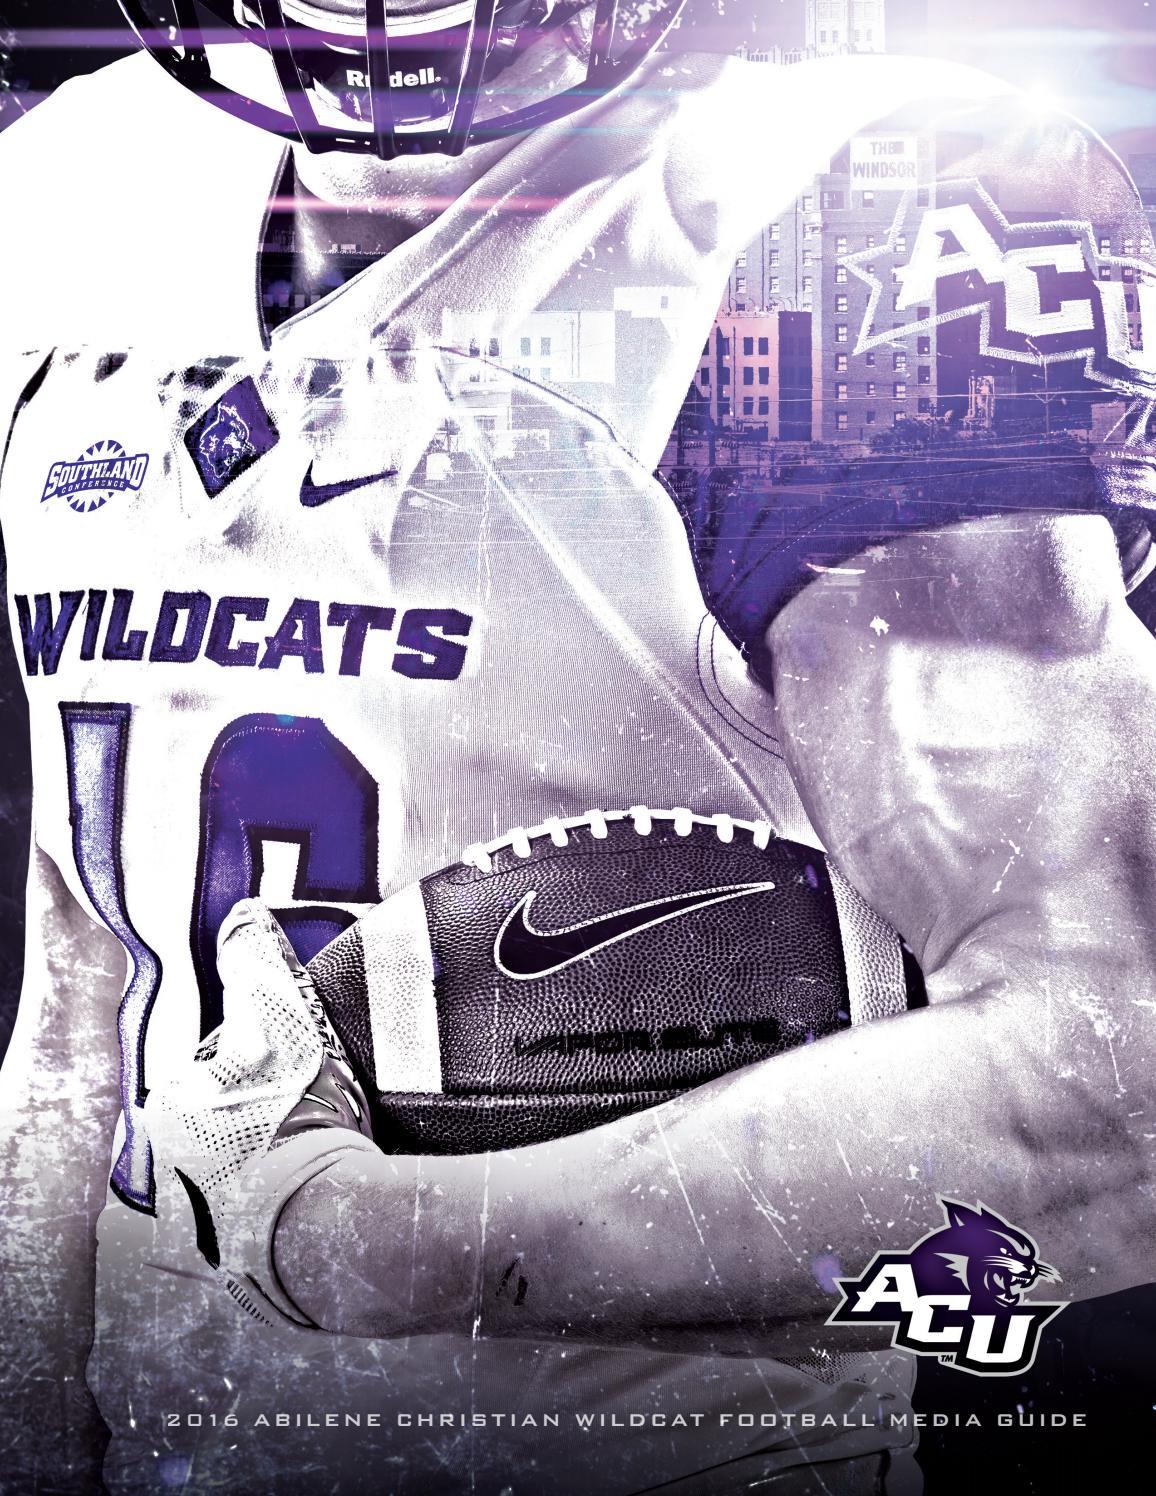 2016 ACU Wildcat Football Media Guide by Abilene Christian University -  issuu